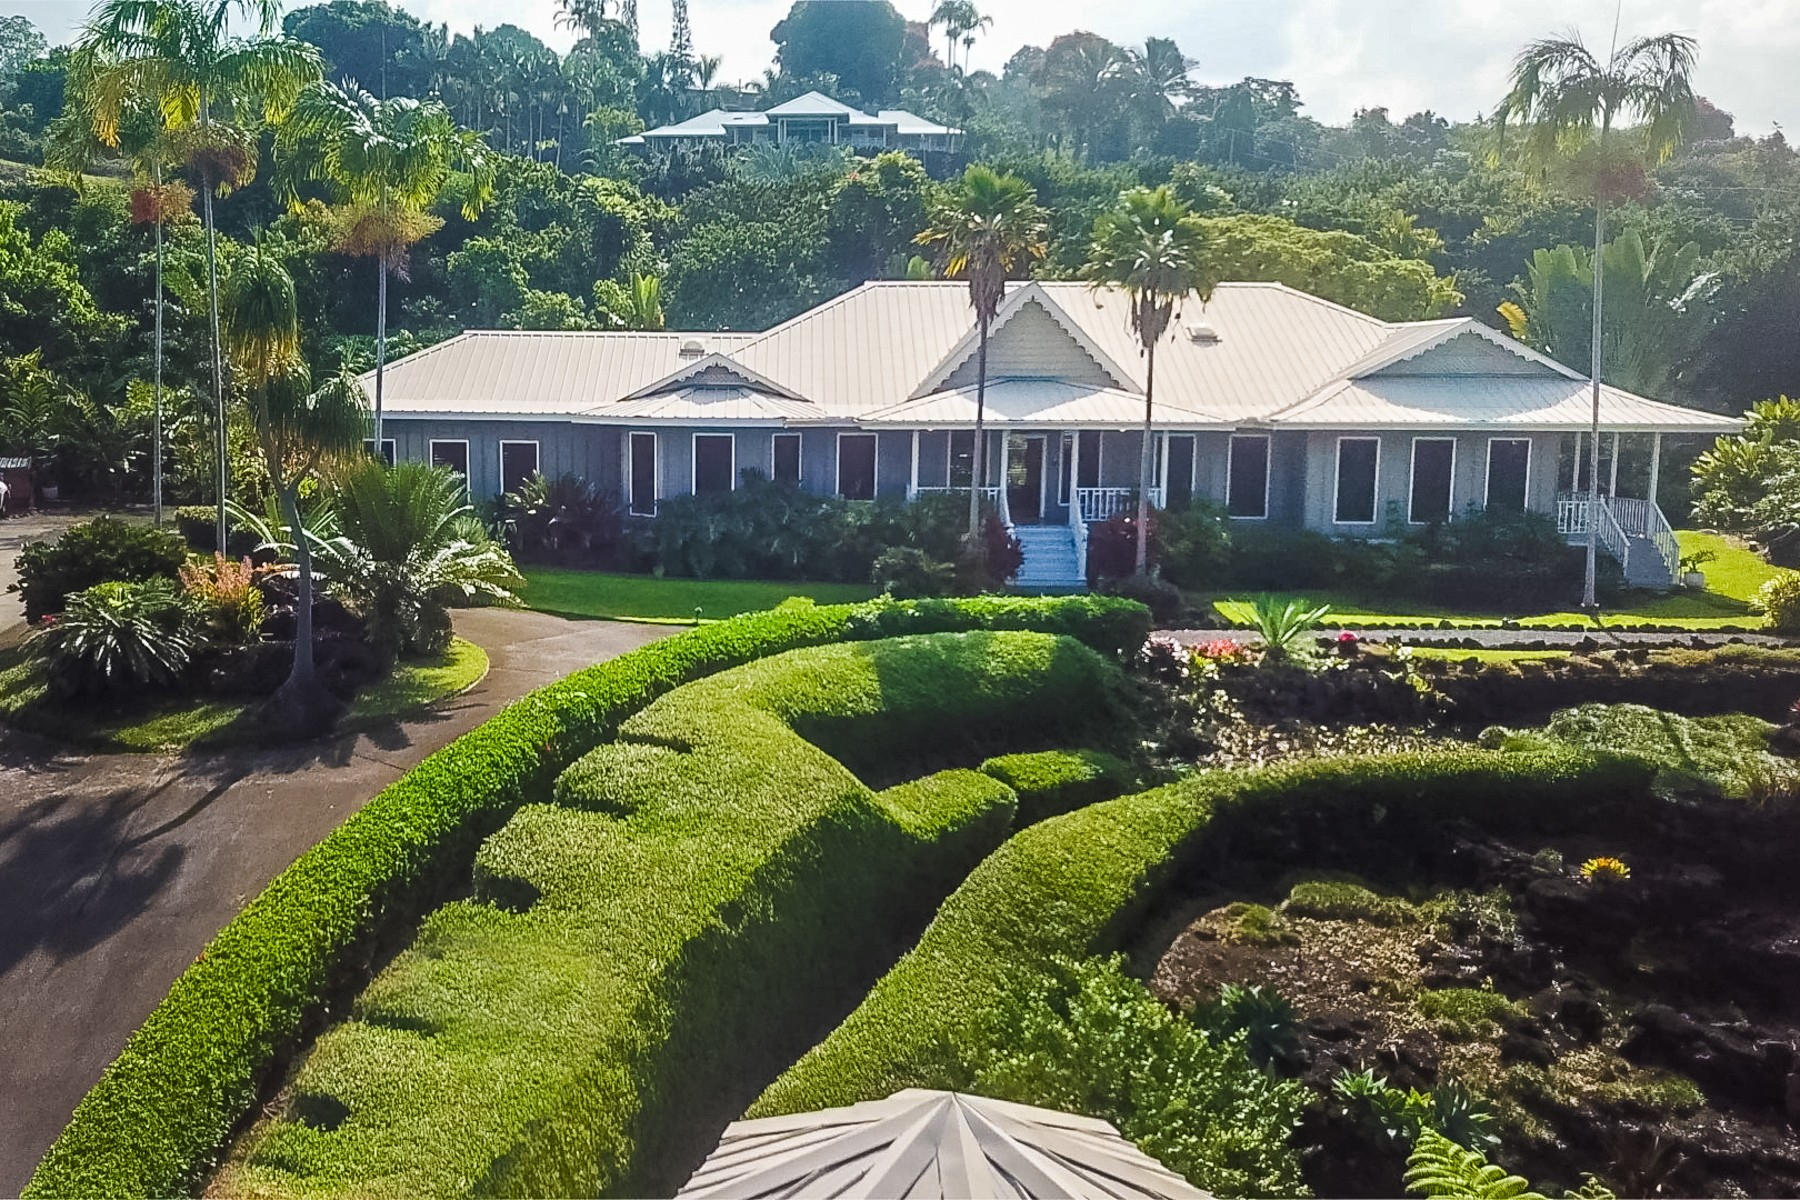 Casa Unifamiliar por un Venta en Maluhia Mauka 75-108 Lolo Ln, Kailua-Kona, Hawaii, 96740 Estados Unidos